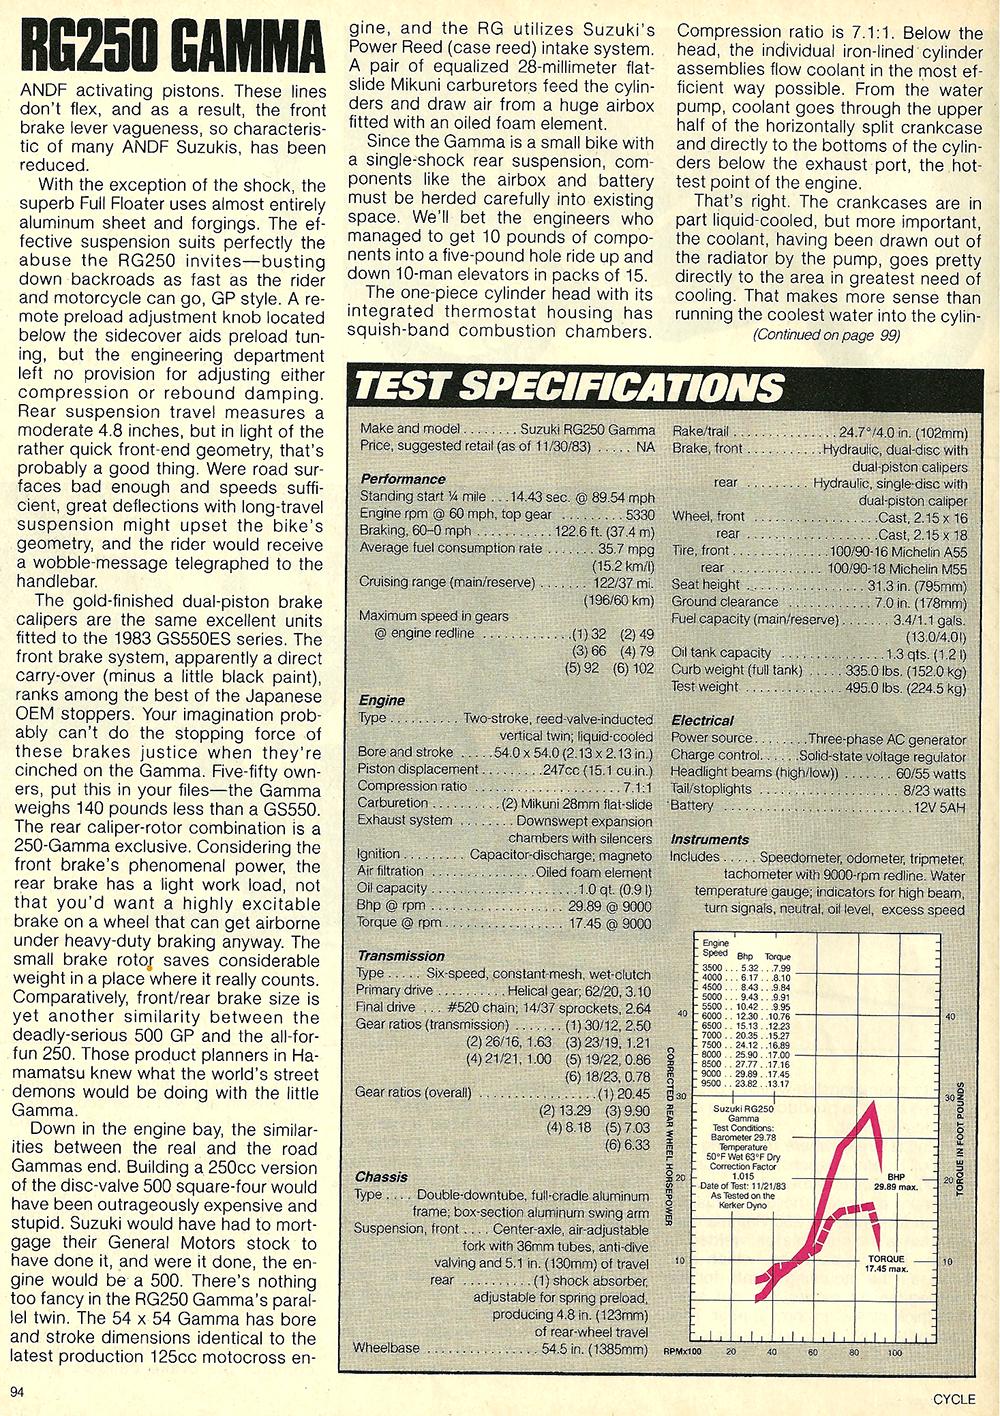 1984 Suzuki RG250 Gamma road test 7.jpg